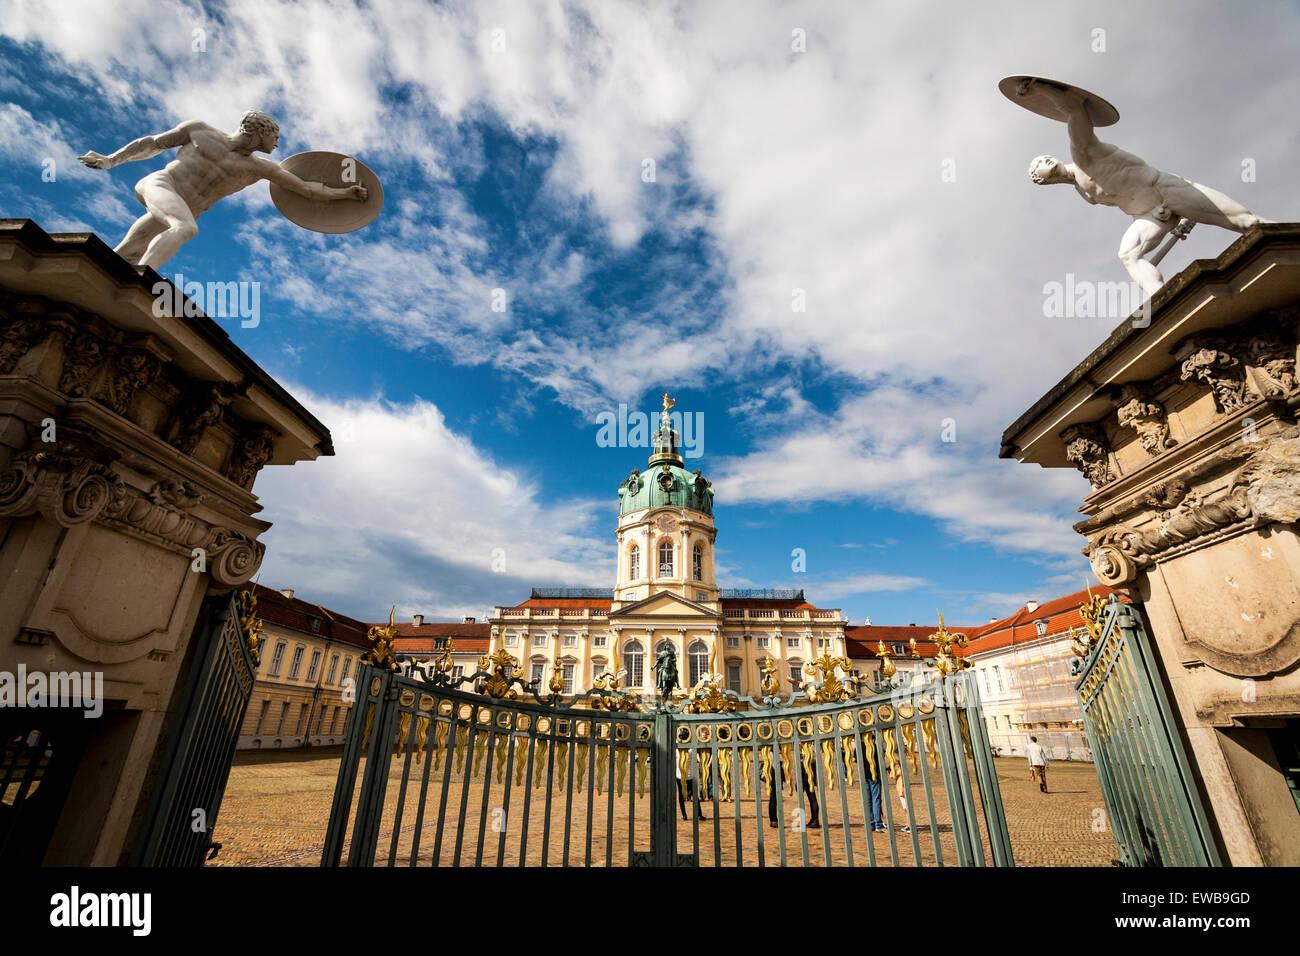 Charlottenburg Palace, Berlin, Germany Stock Photo